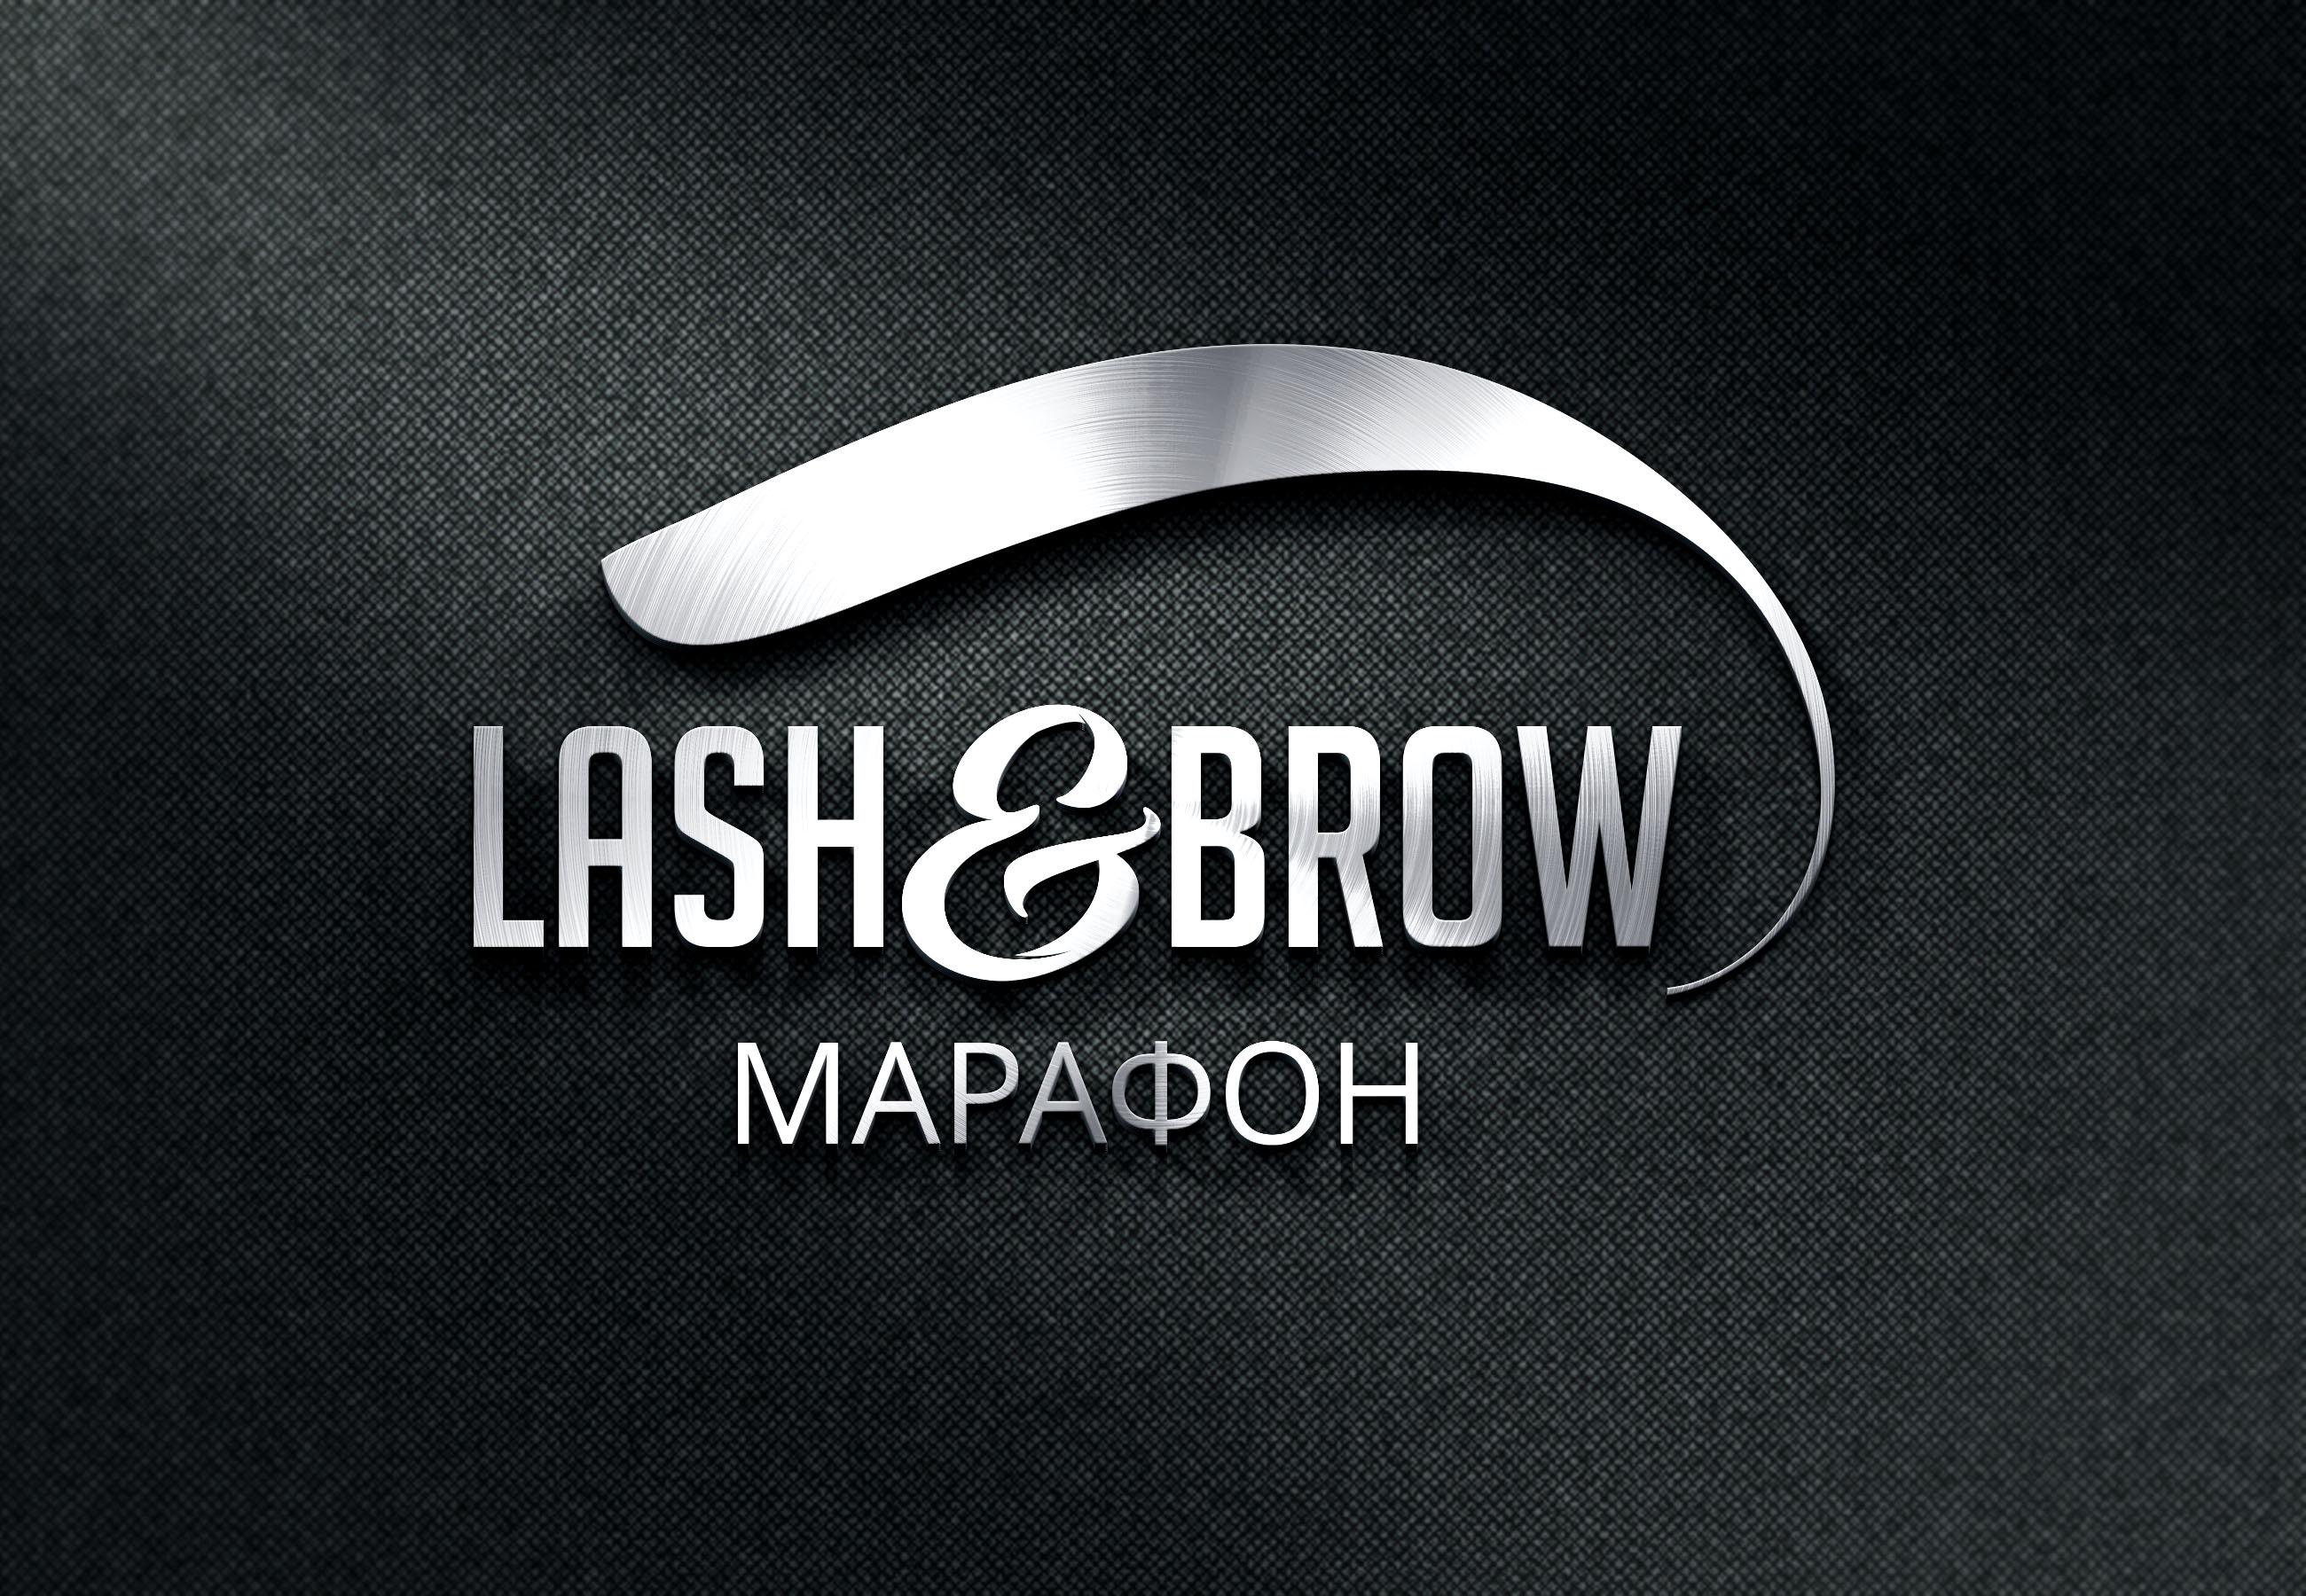 "Создание логотипа мероприятия ""Марафон Lash&Brow"" фото f_17958f906c302ea6.jpg"